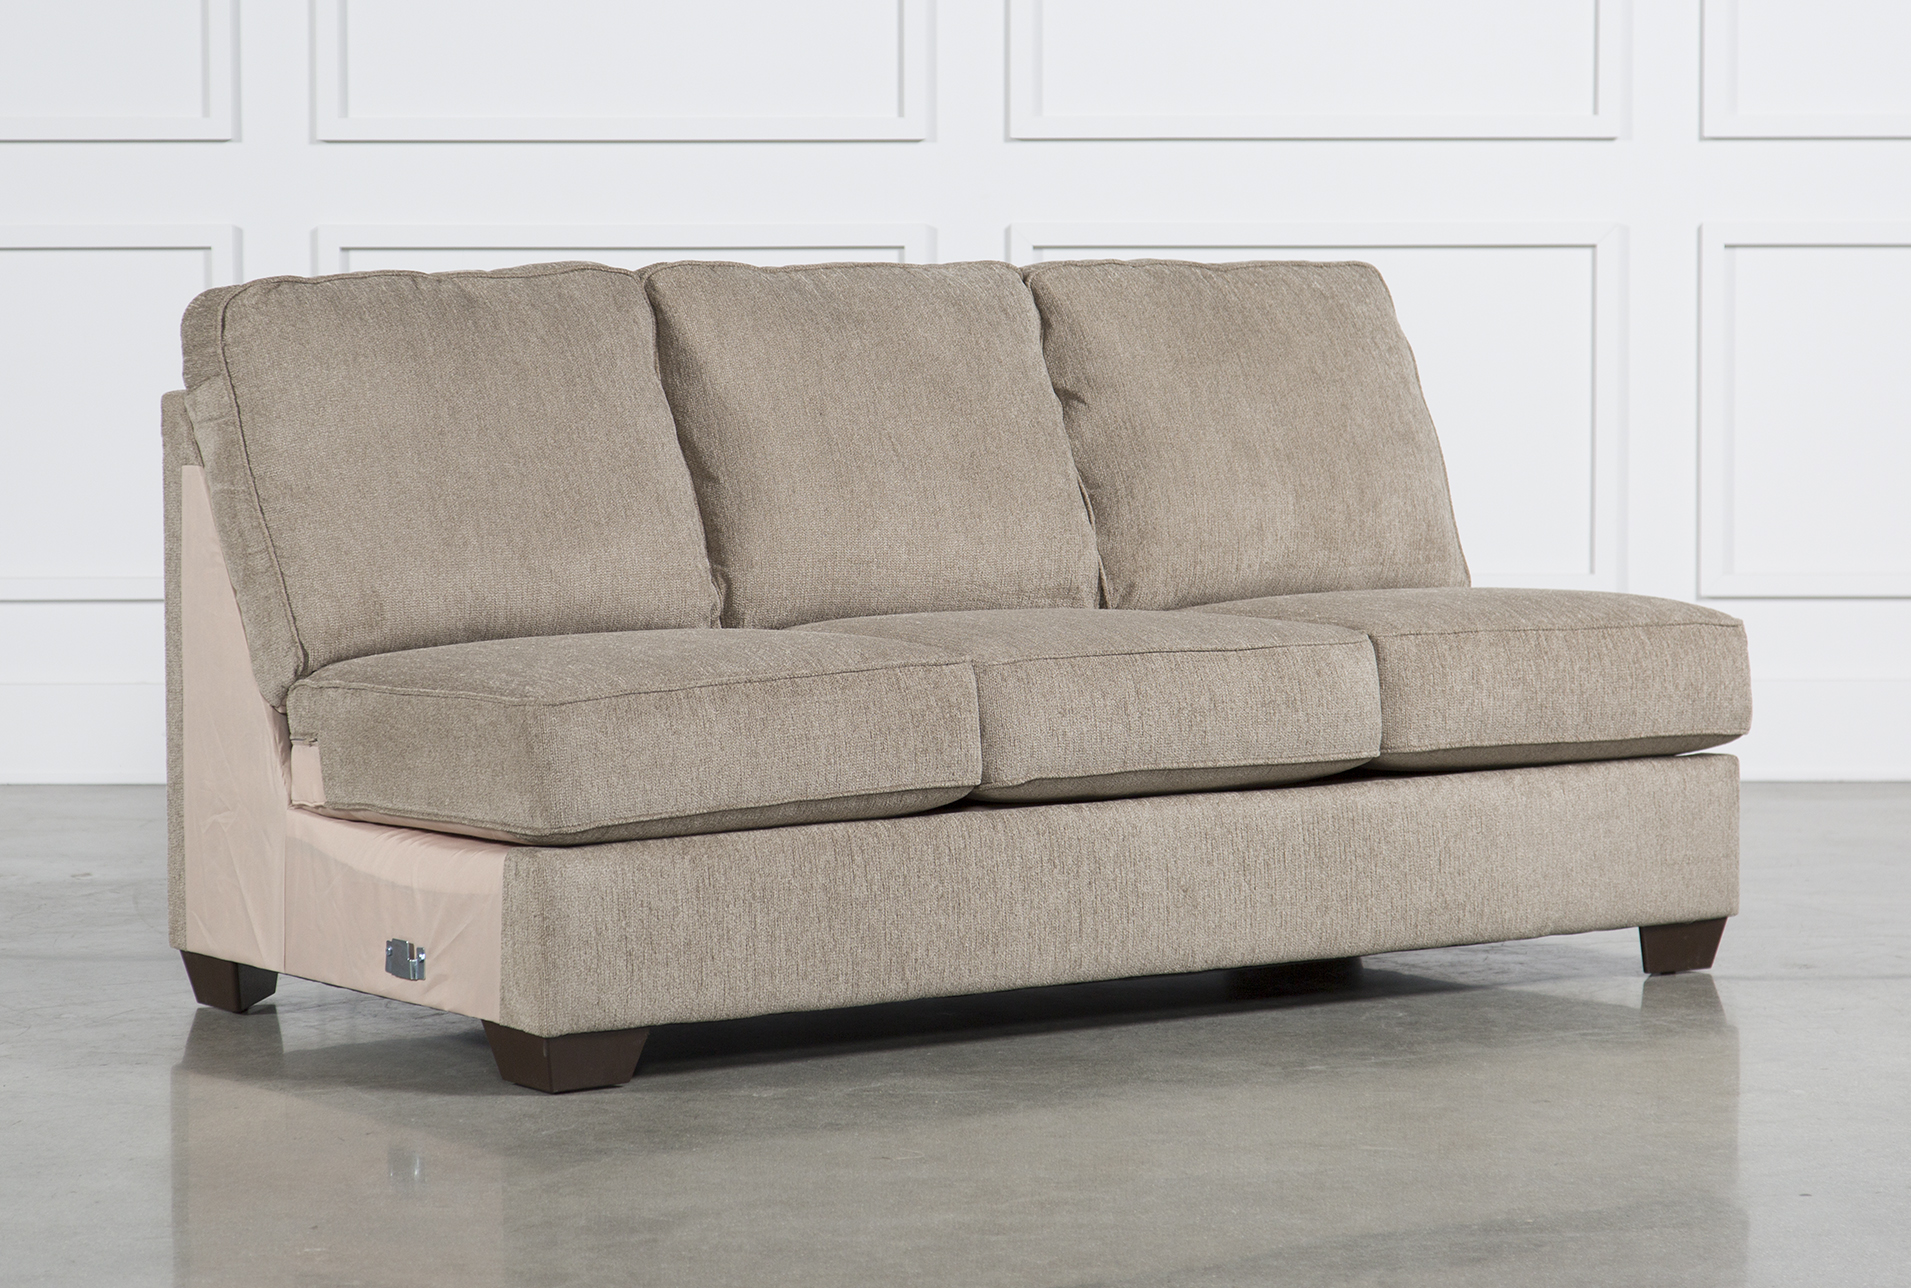 Patola Park Armless Sofa   360